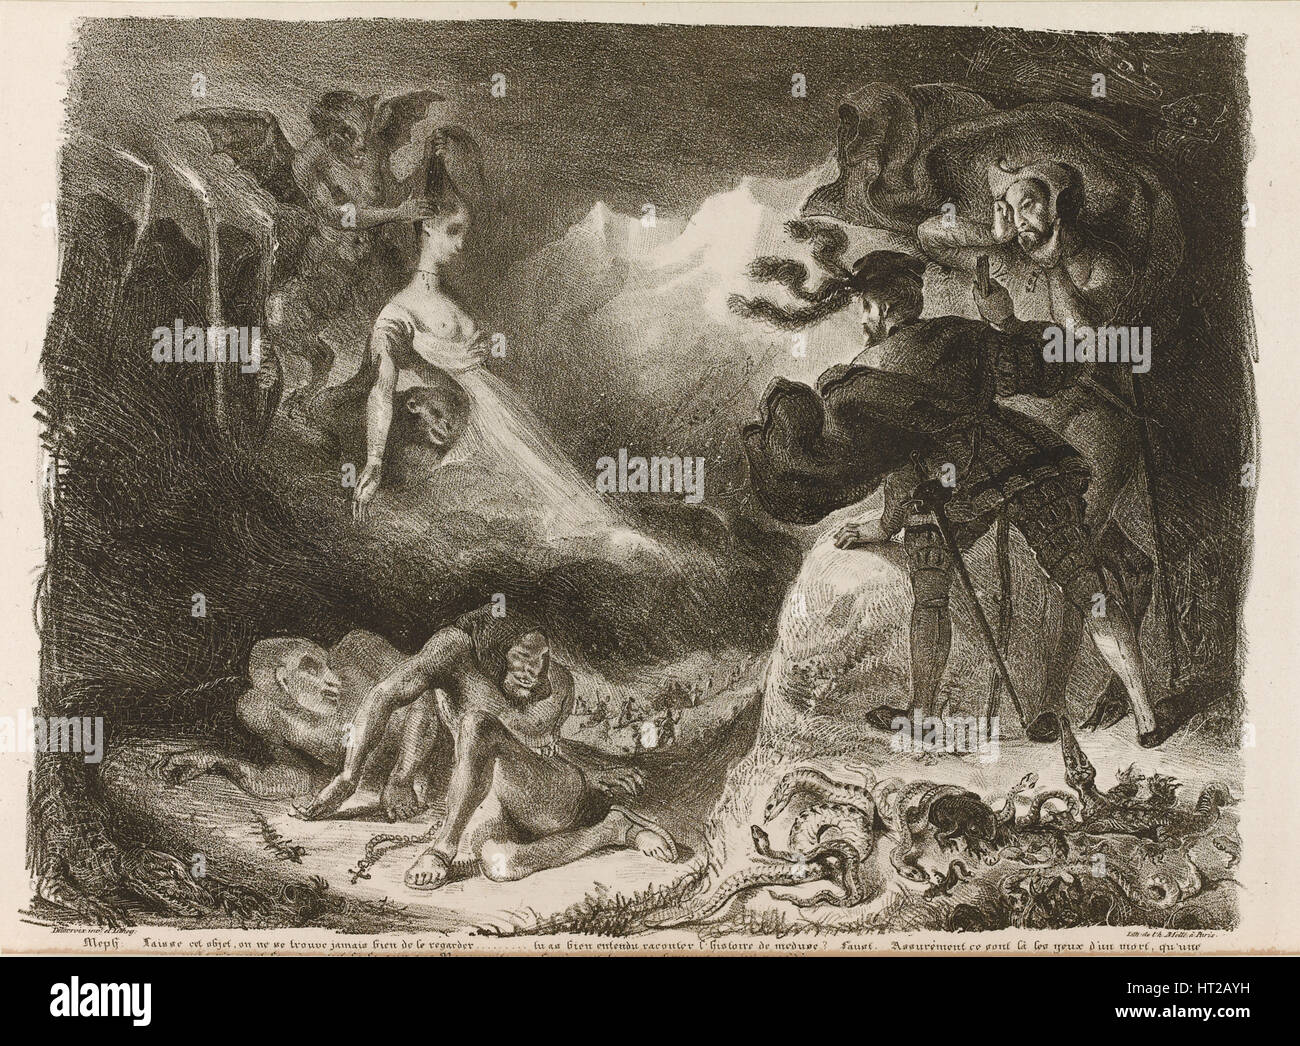 Illustration to Goethe's Faust, 1828. Artist: Delacroix, Eugène (1798-1863) - Stock Image